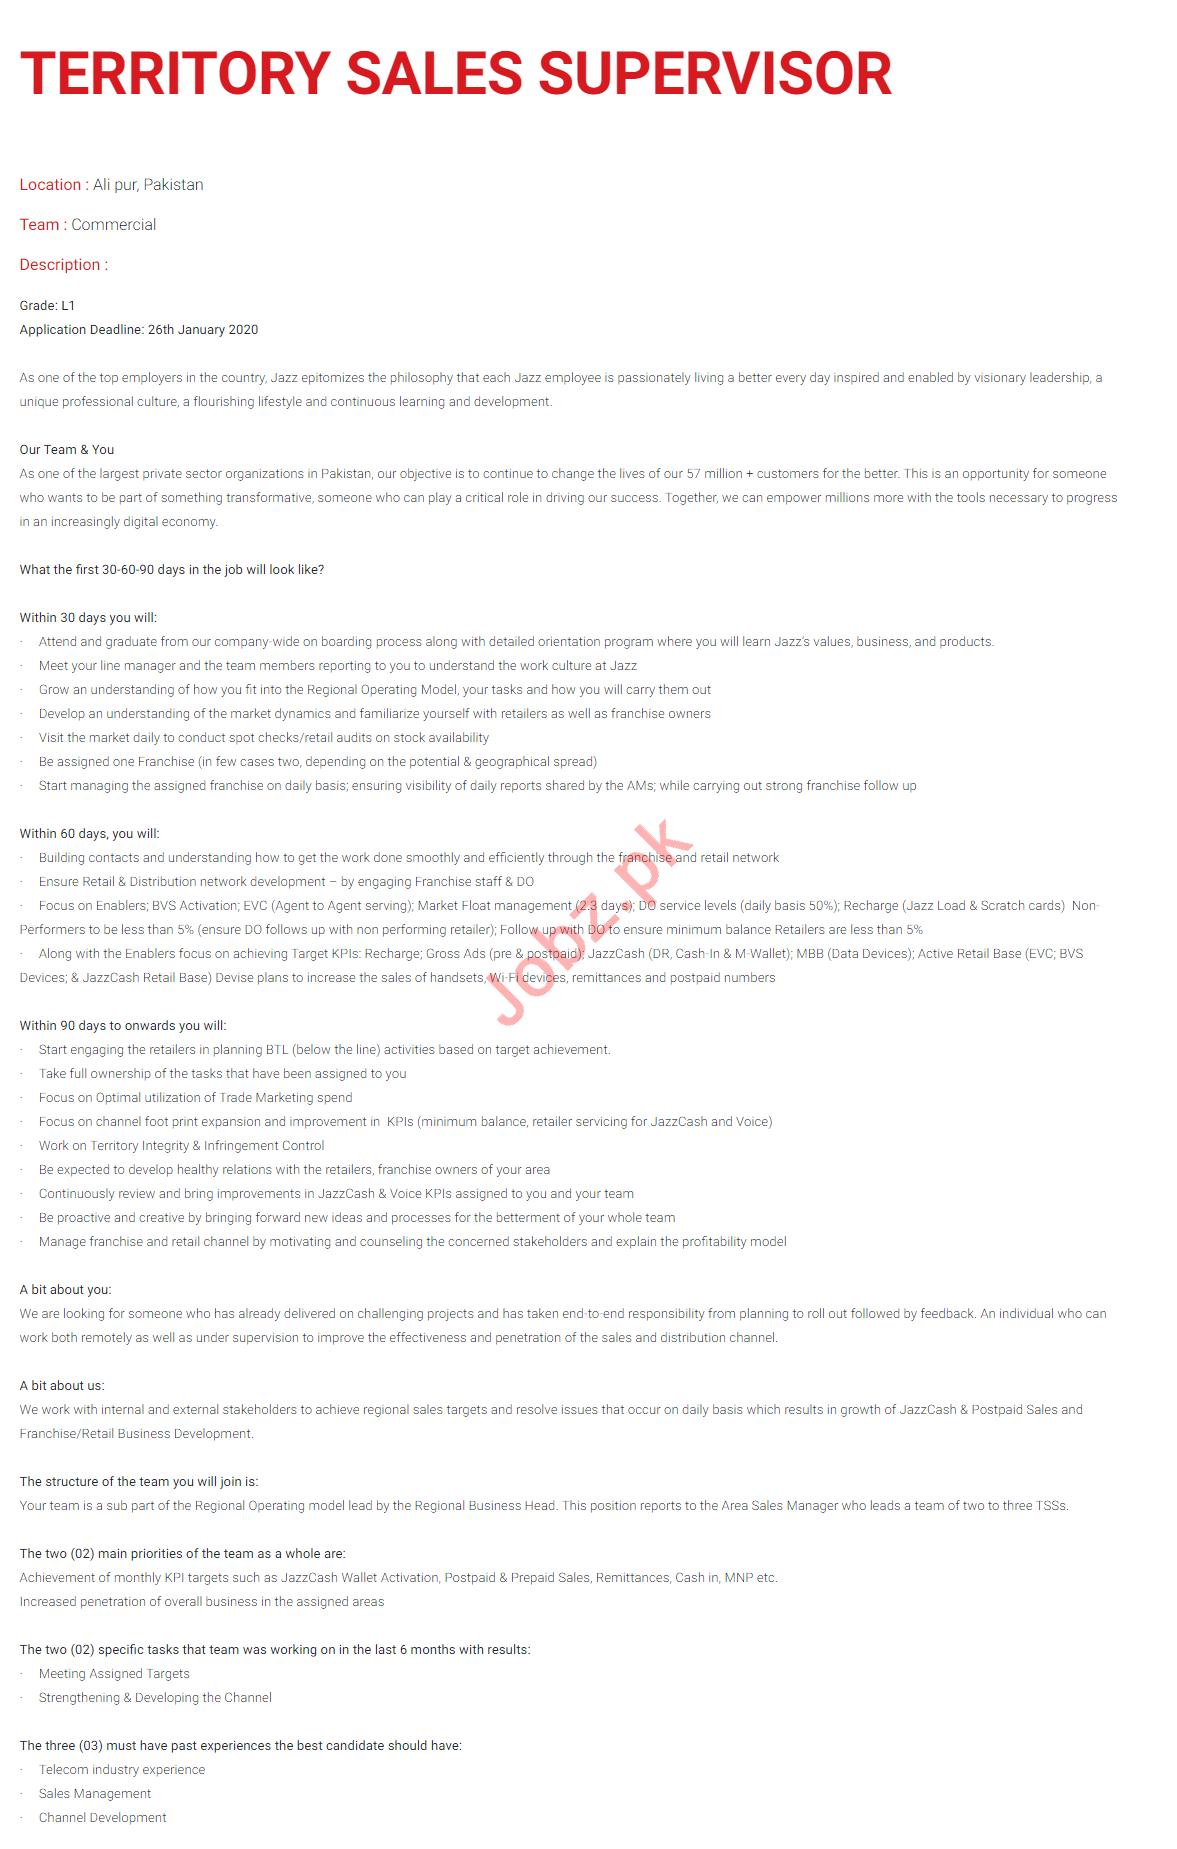 Territory Sales Supervisor Job 2020 in Ali Pur Islamabad